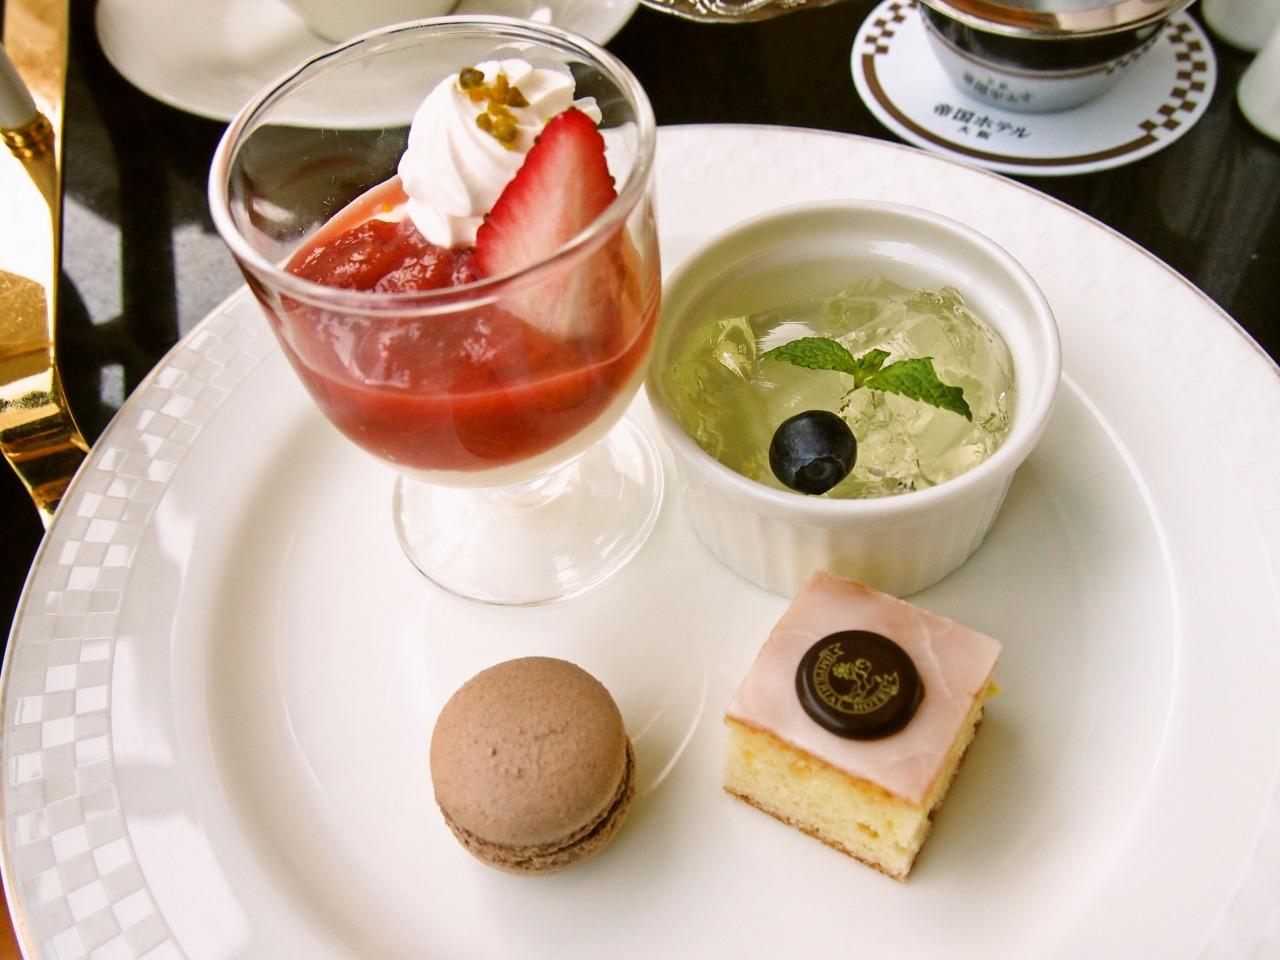 s-foodpic7963342.jpg